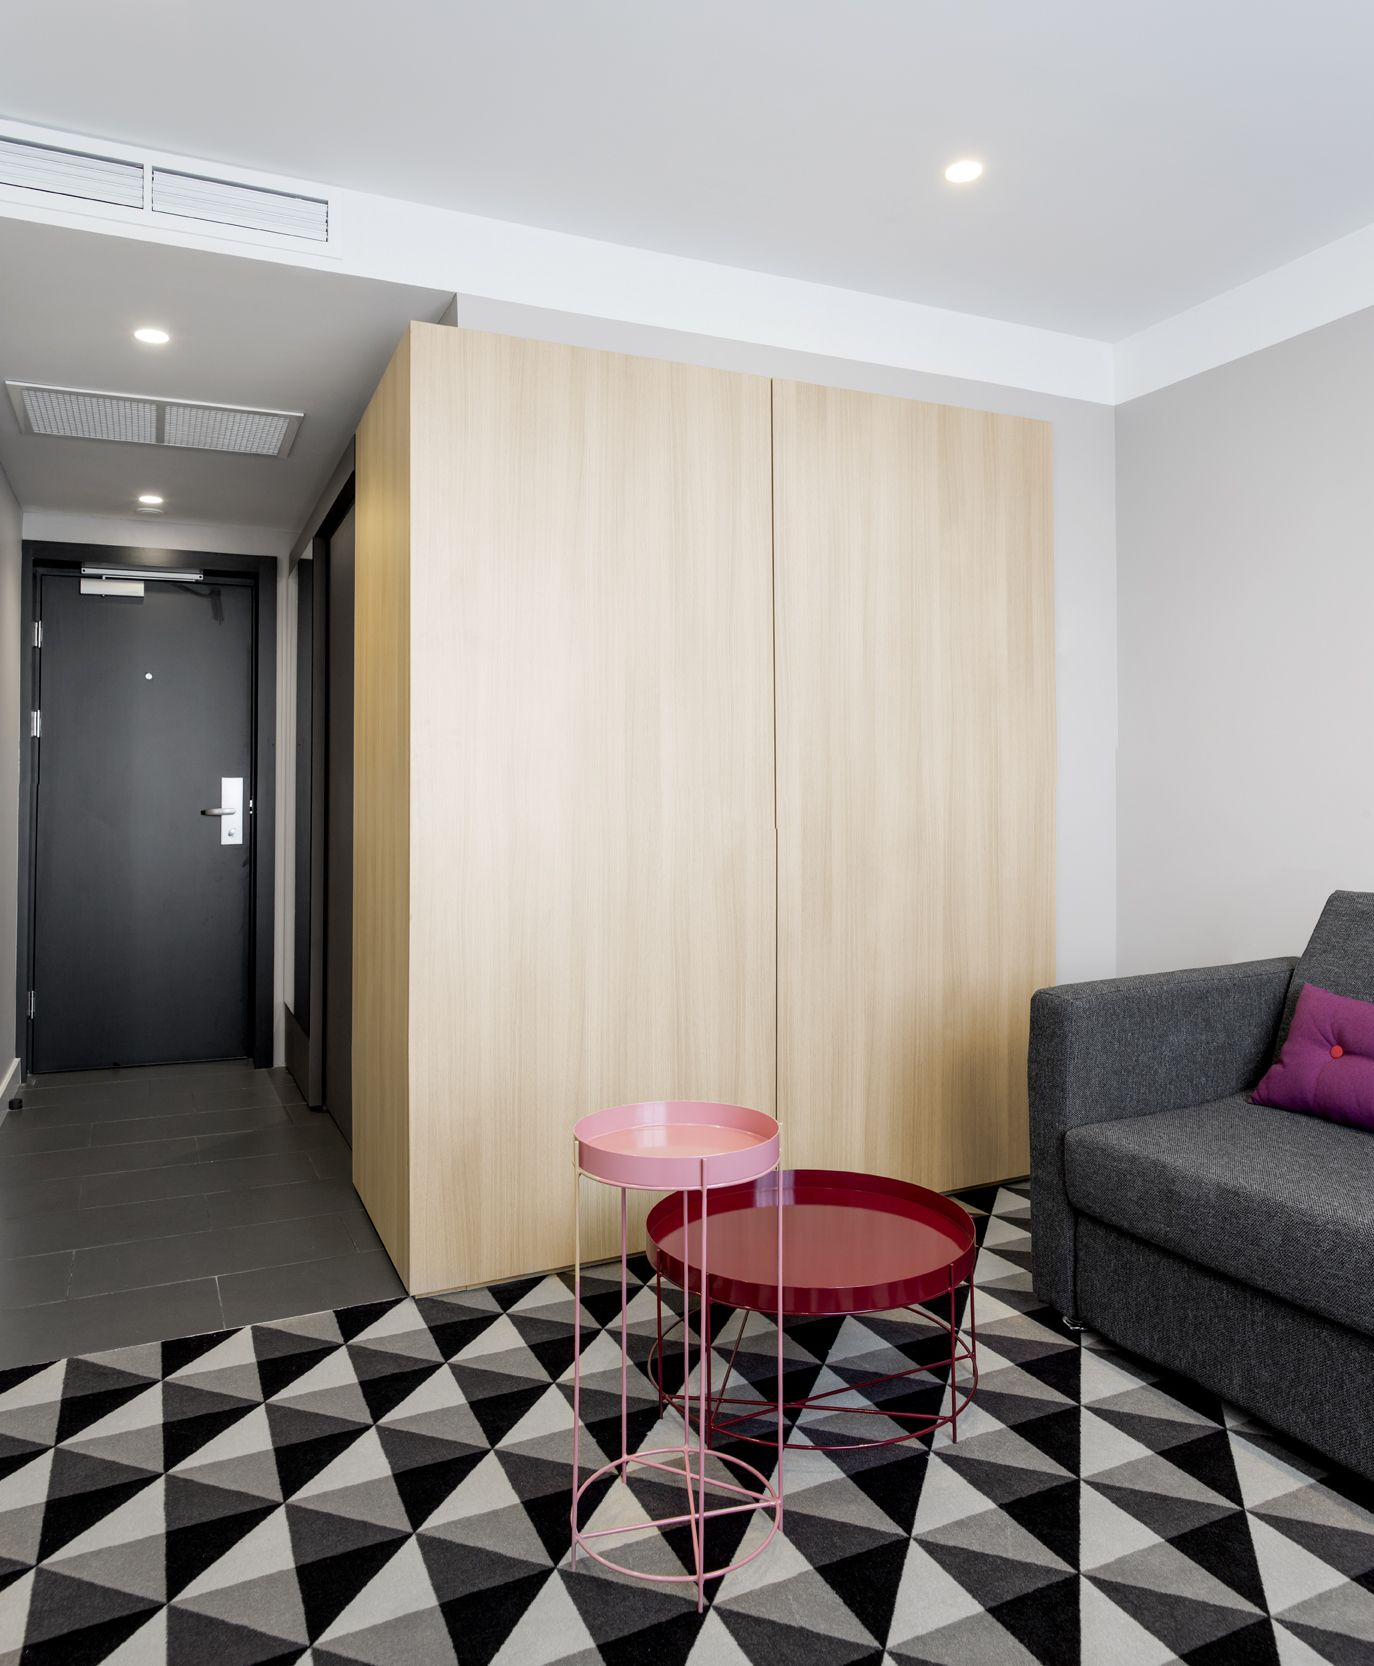 russia 2015 - azimut - international chain - modern - hotel room